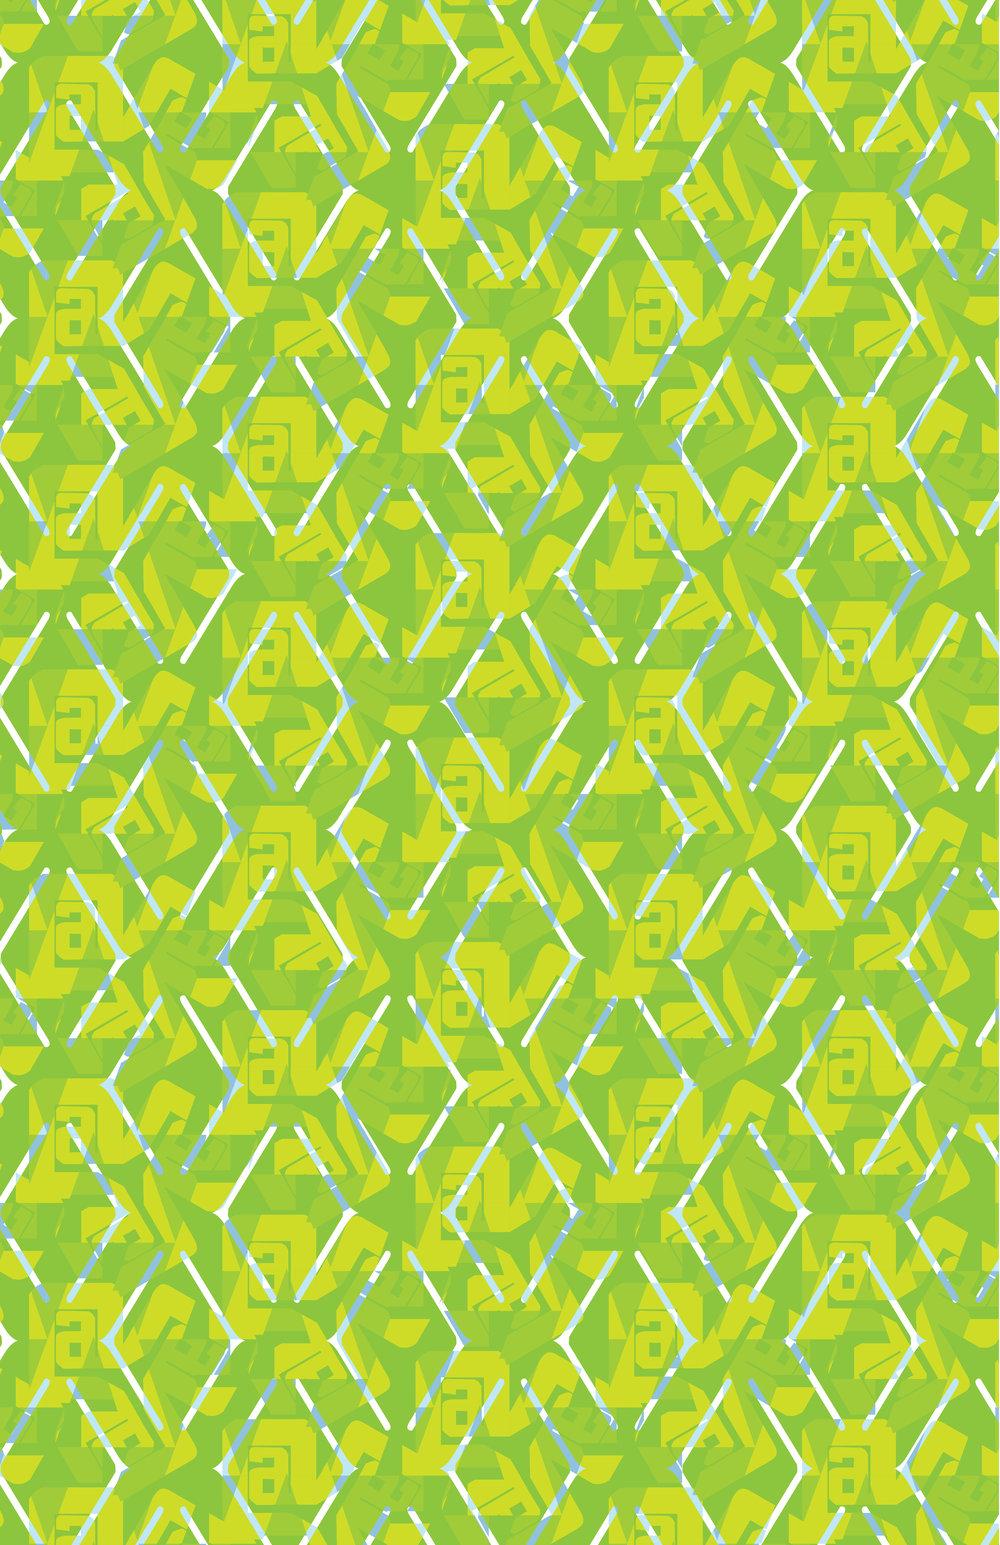 pattern1-03.jpg